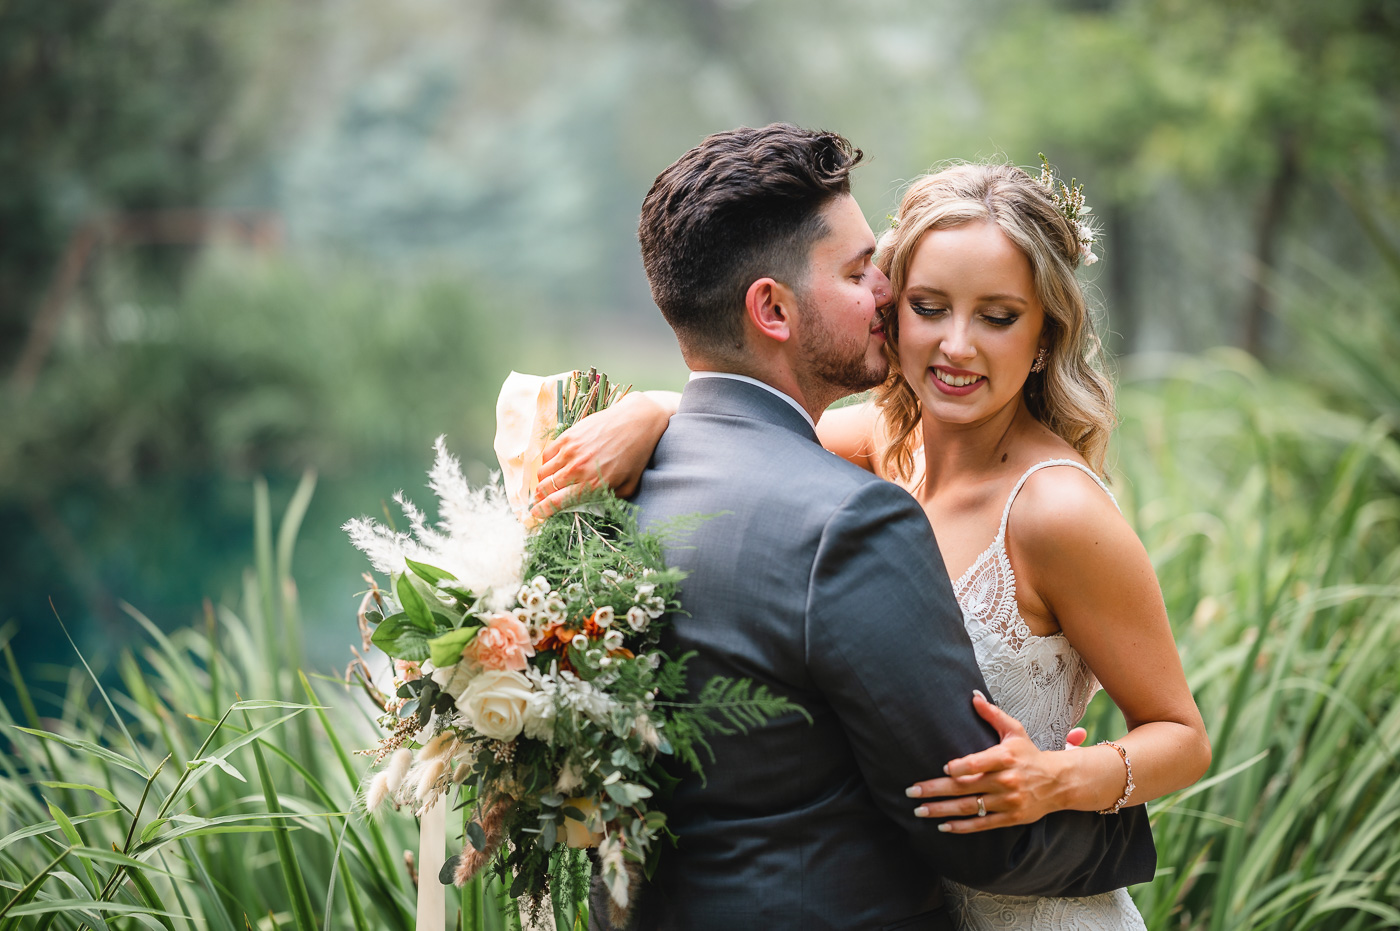 A newlywed couple embraces at a High Sierra Iris & Wedding Garden Wedding